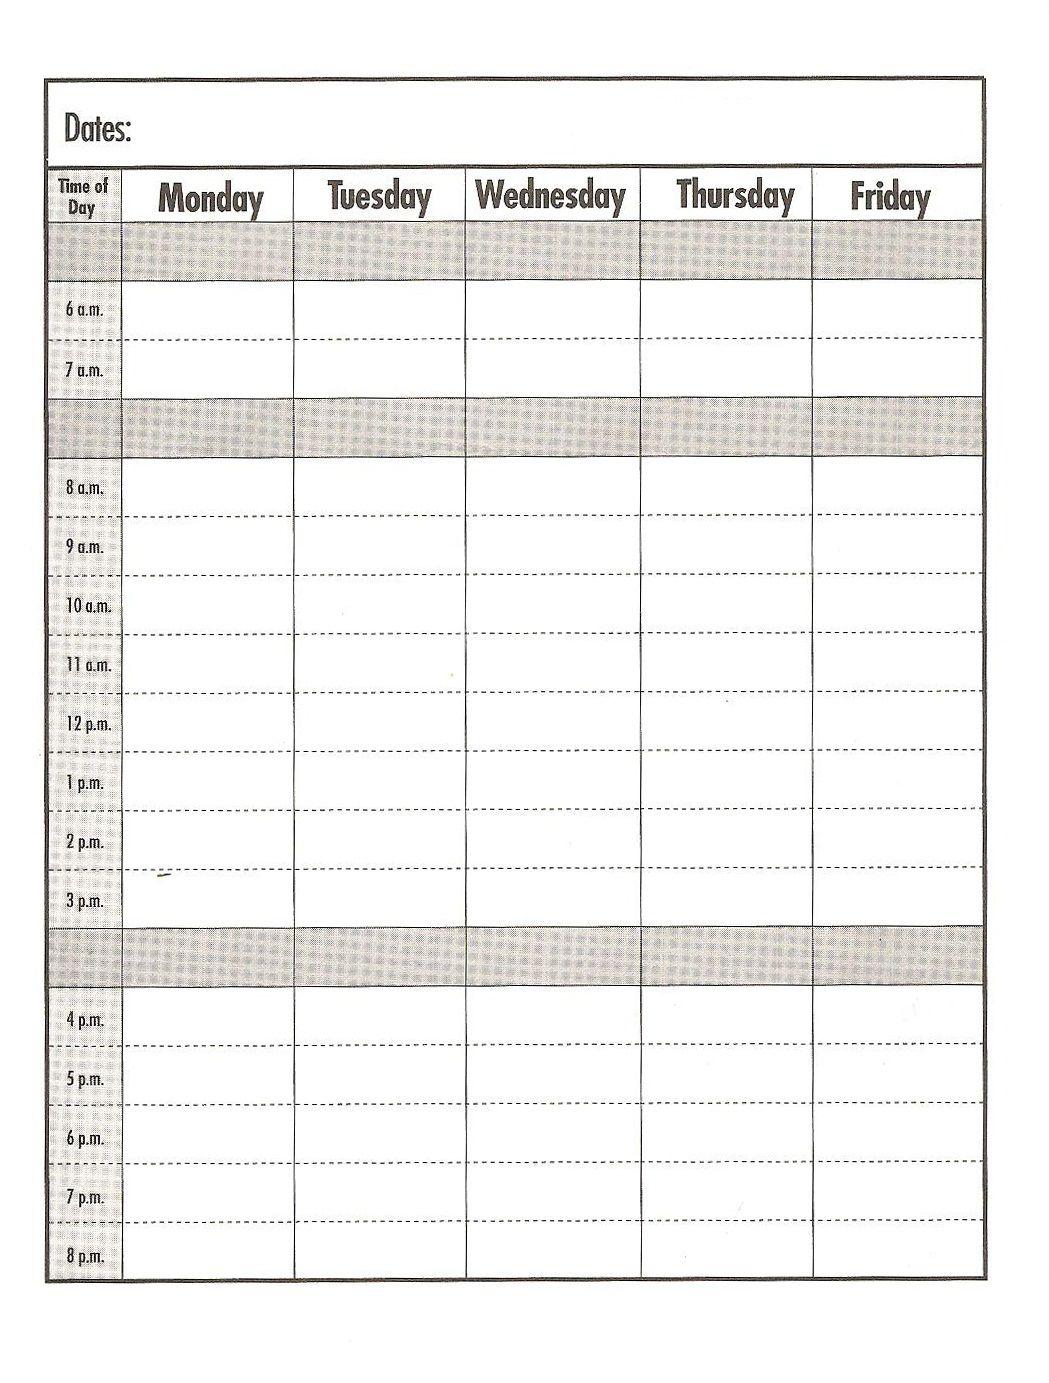 Weekday schedule templateprint out education school organizing weekday schedule templateprint out education school maxwellsz